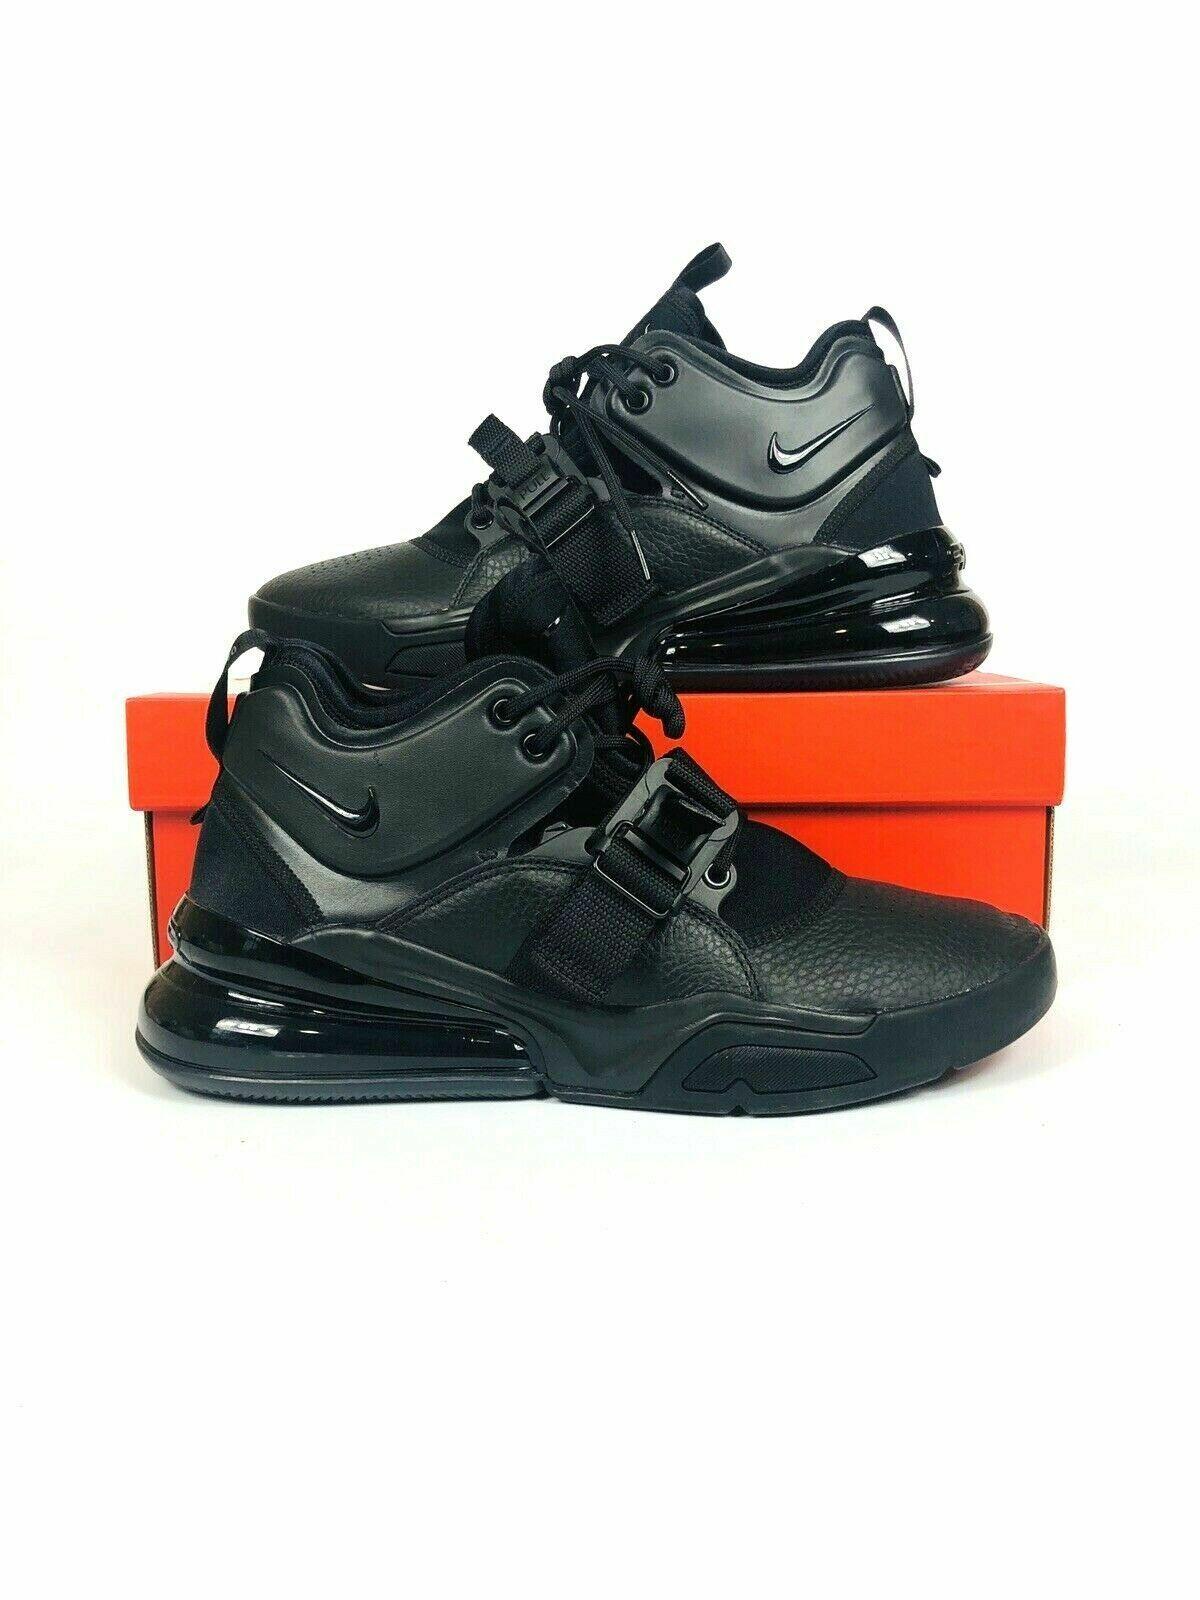 Nike Air Force 270 Triple Black Men Lifestyle shoes Sneakers AH6772-010 Sz 11.5